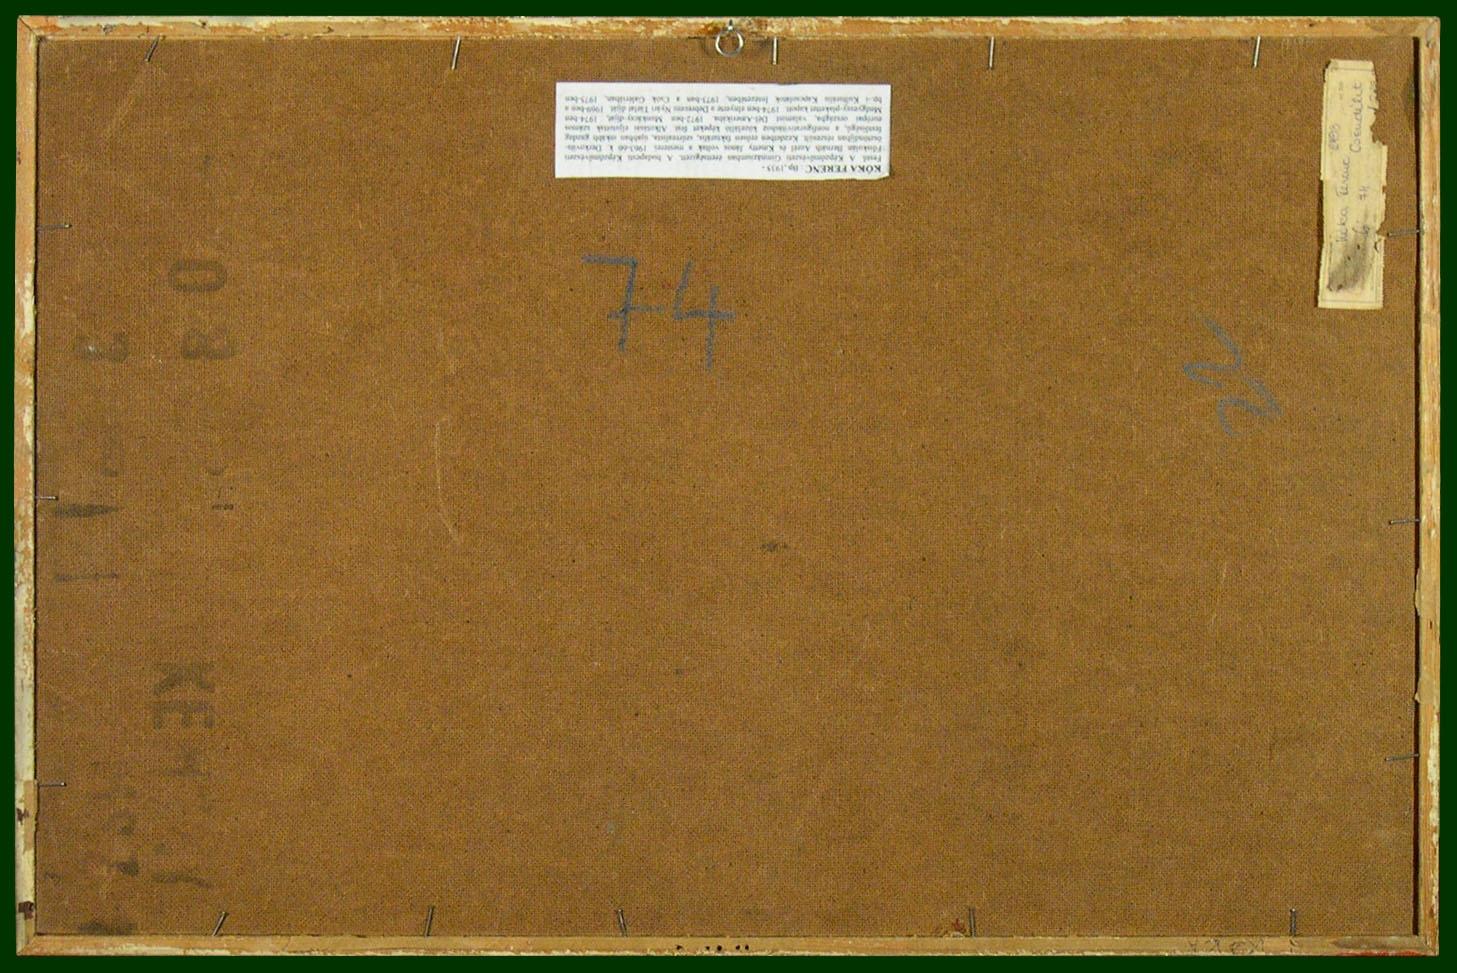 27-2hat.JPG (1457×973)